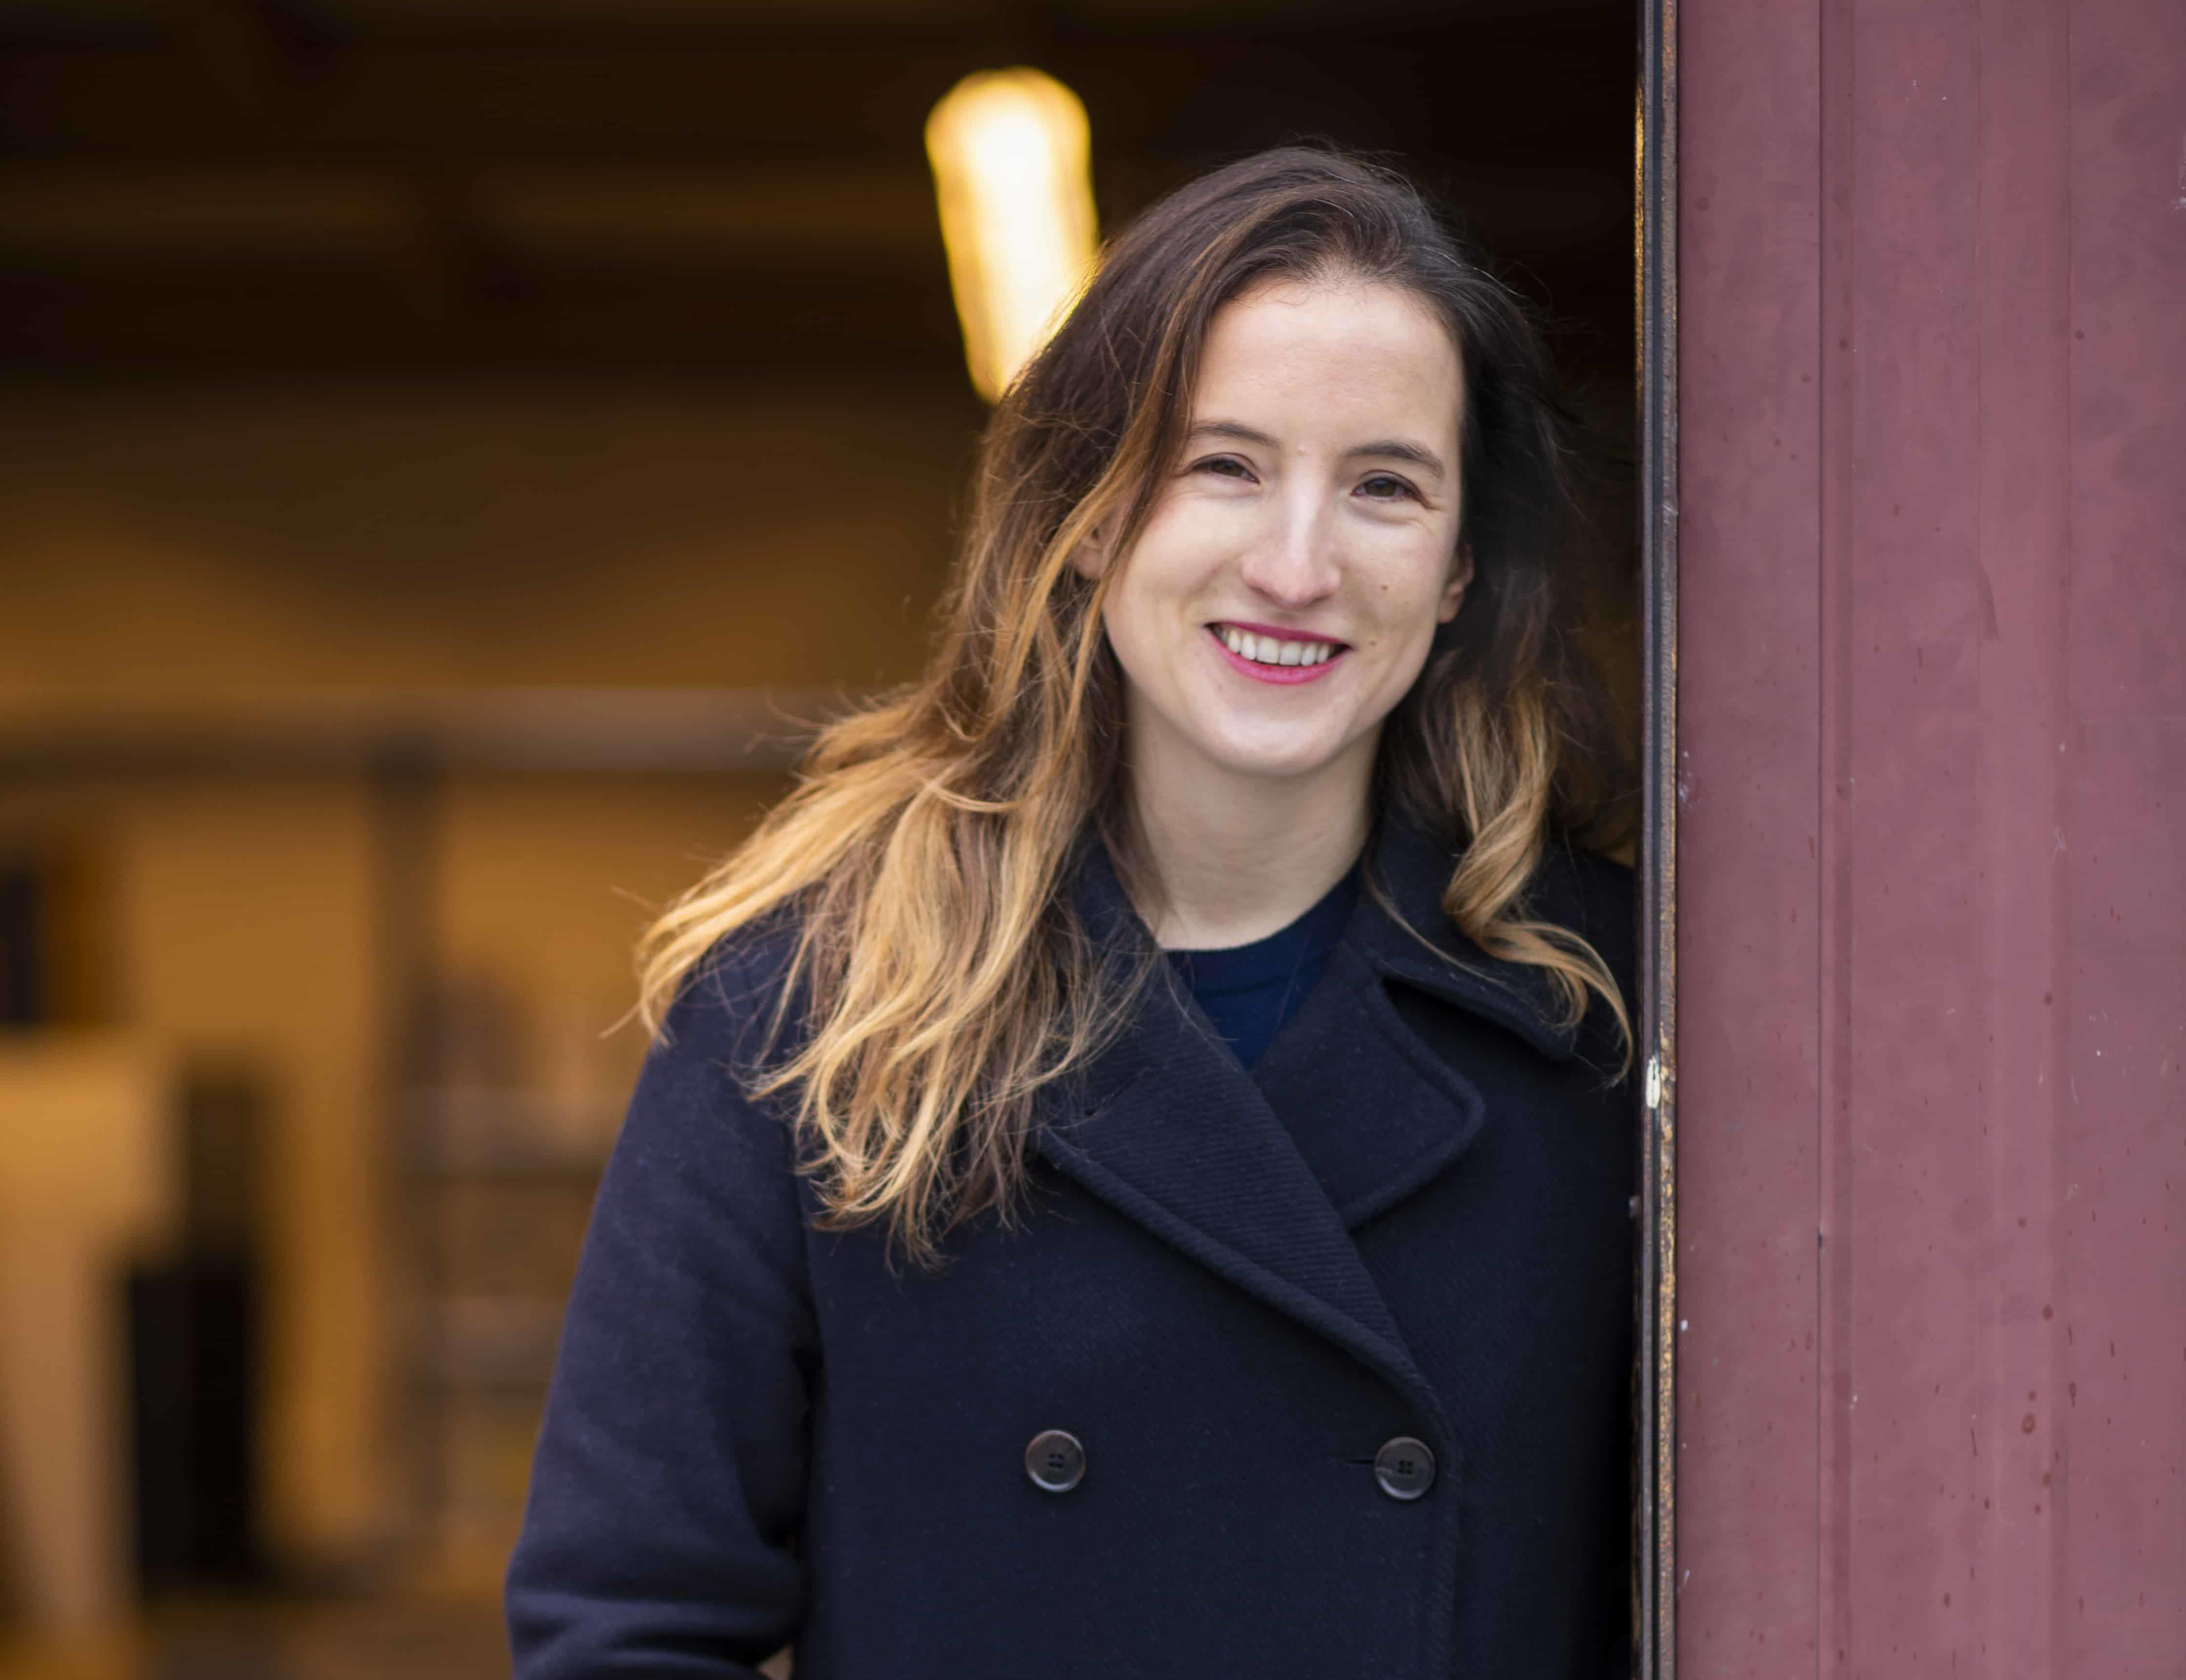 Joanne Boachon, winner of the Terre de Femmes France 2021 Award, Minéka Association for materials recovery